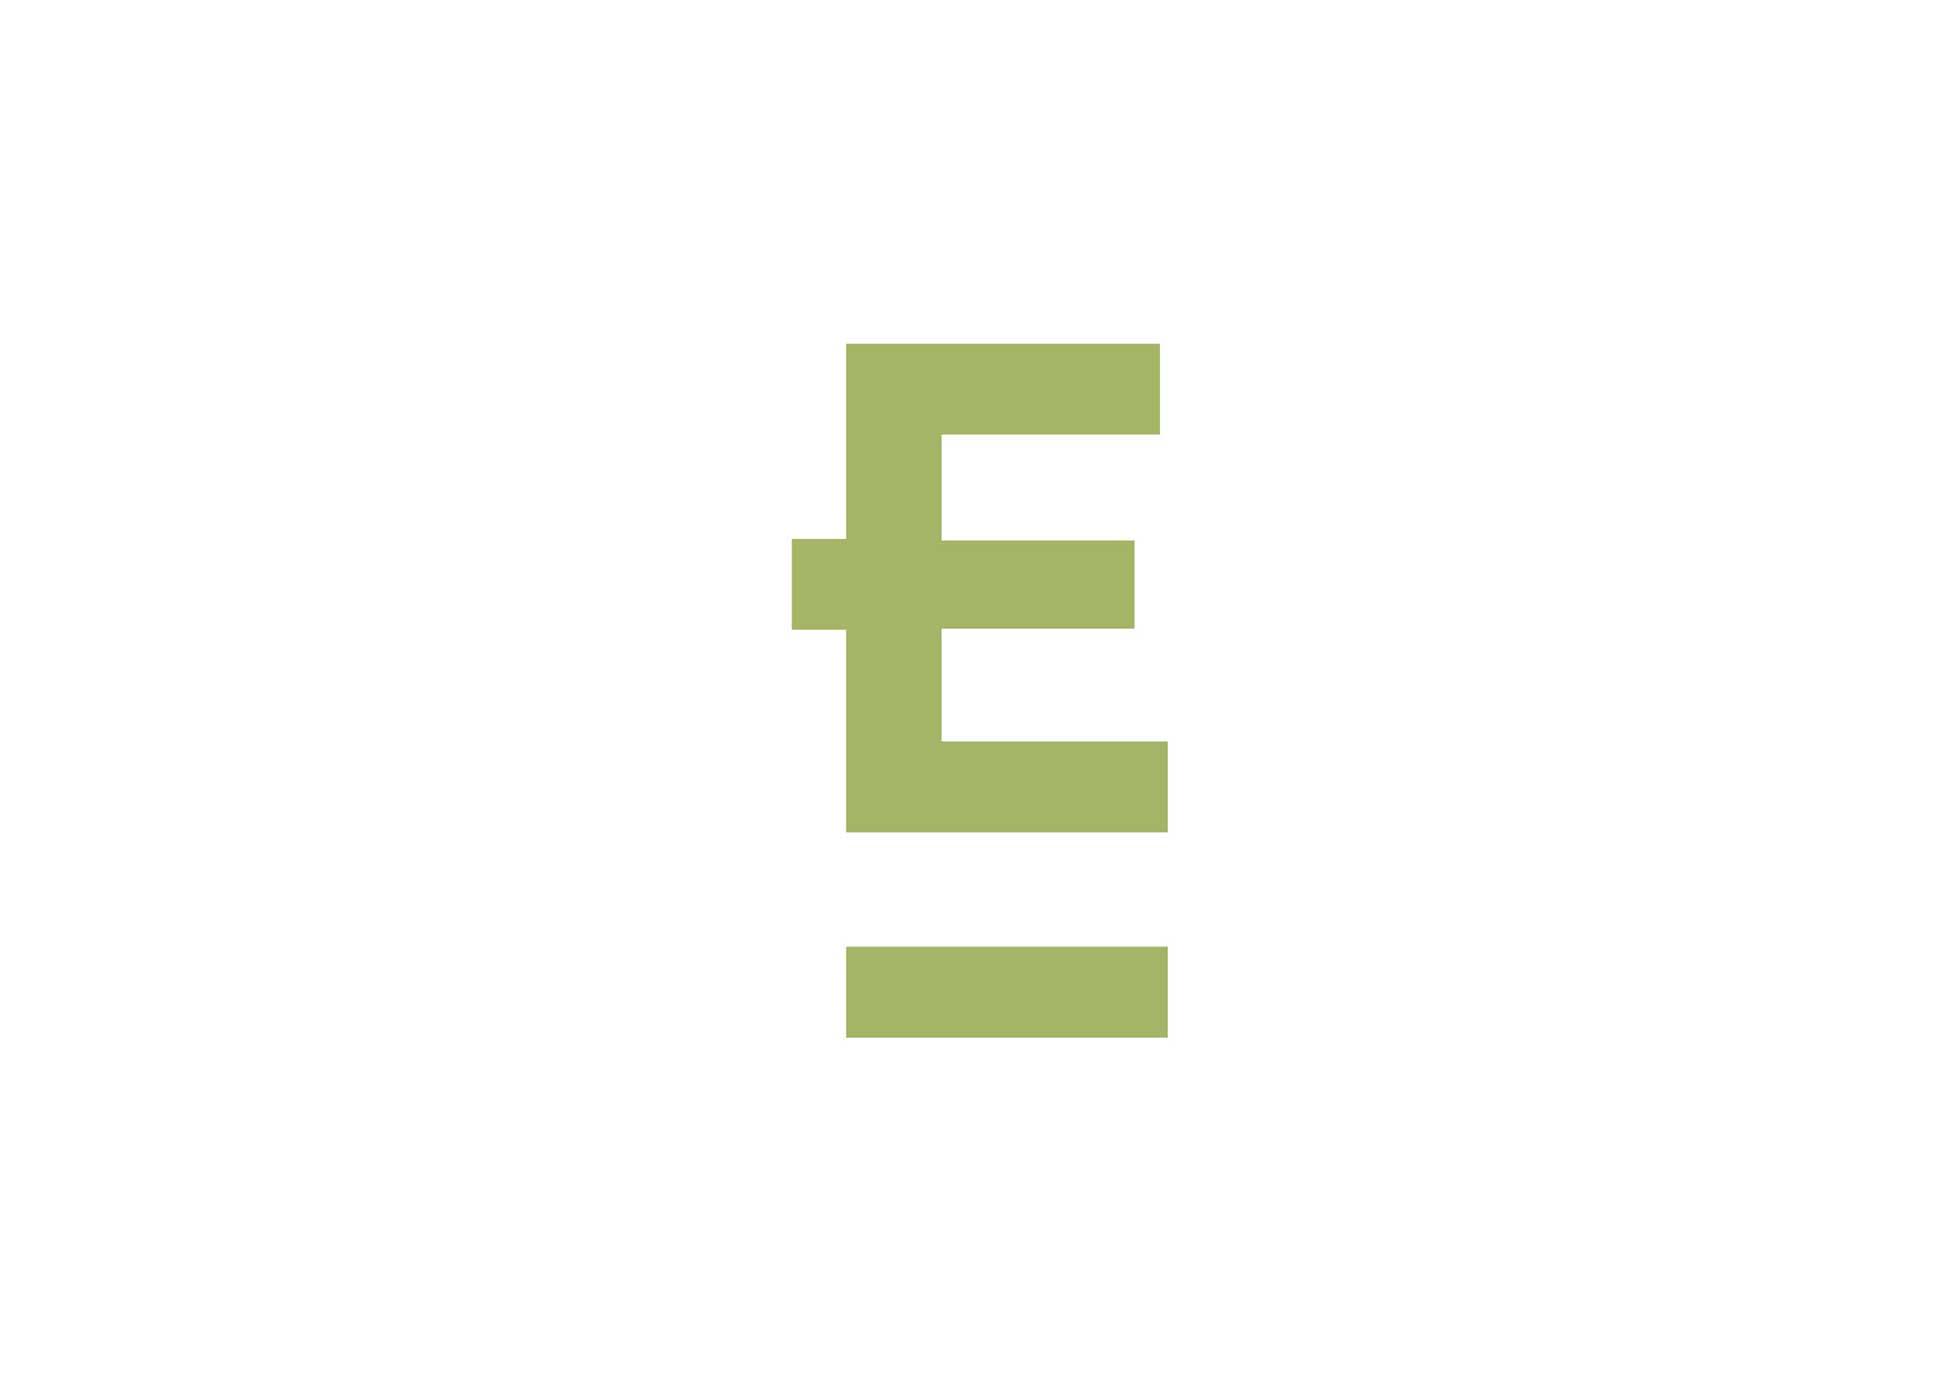 Litevka logo